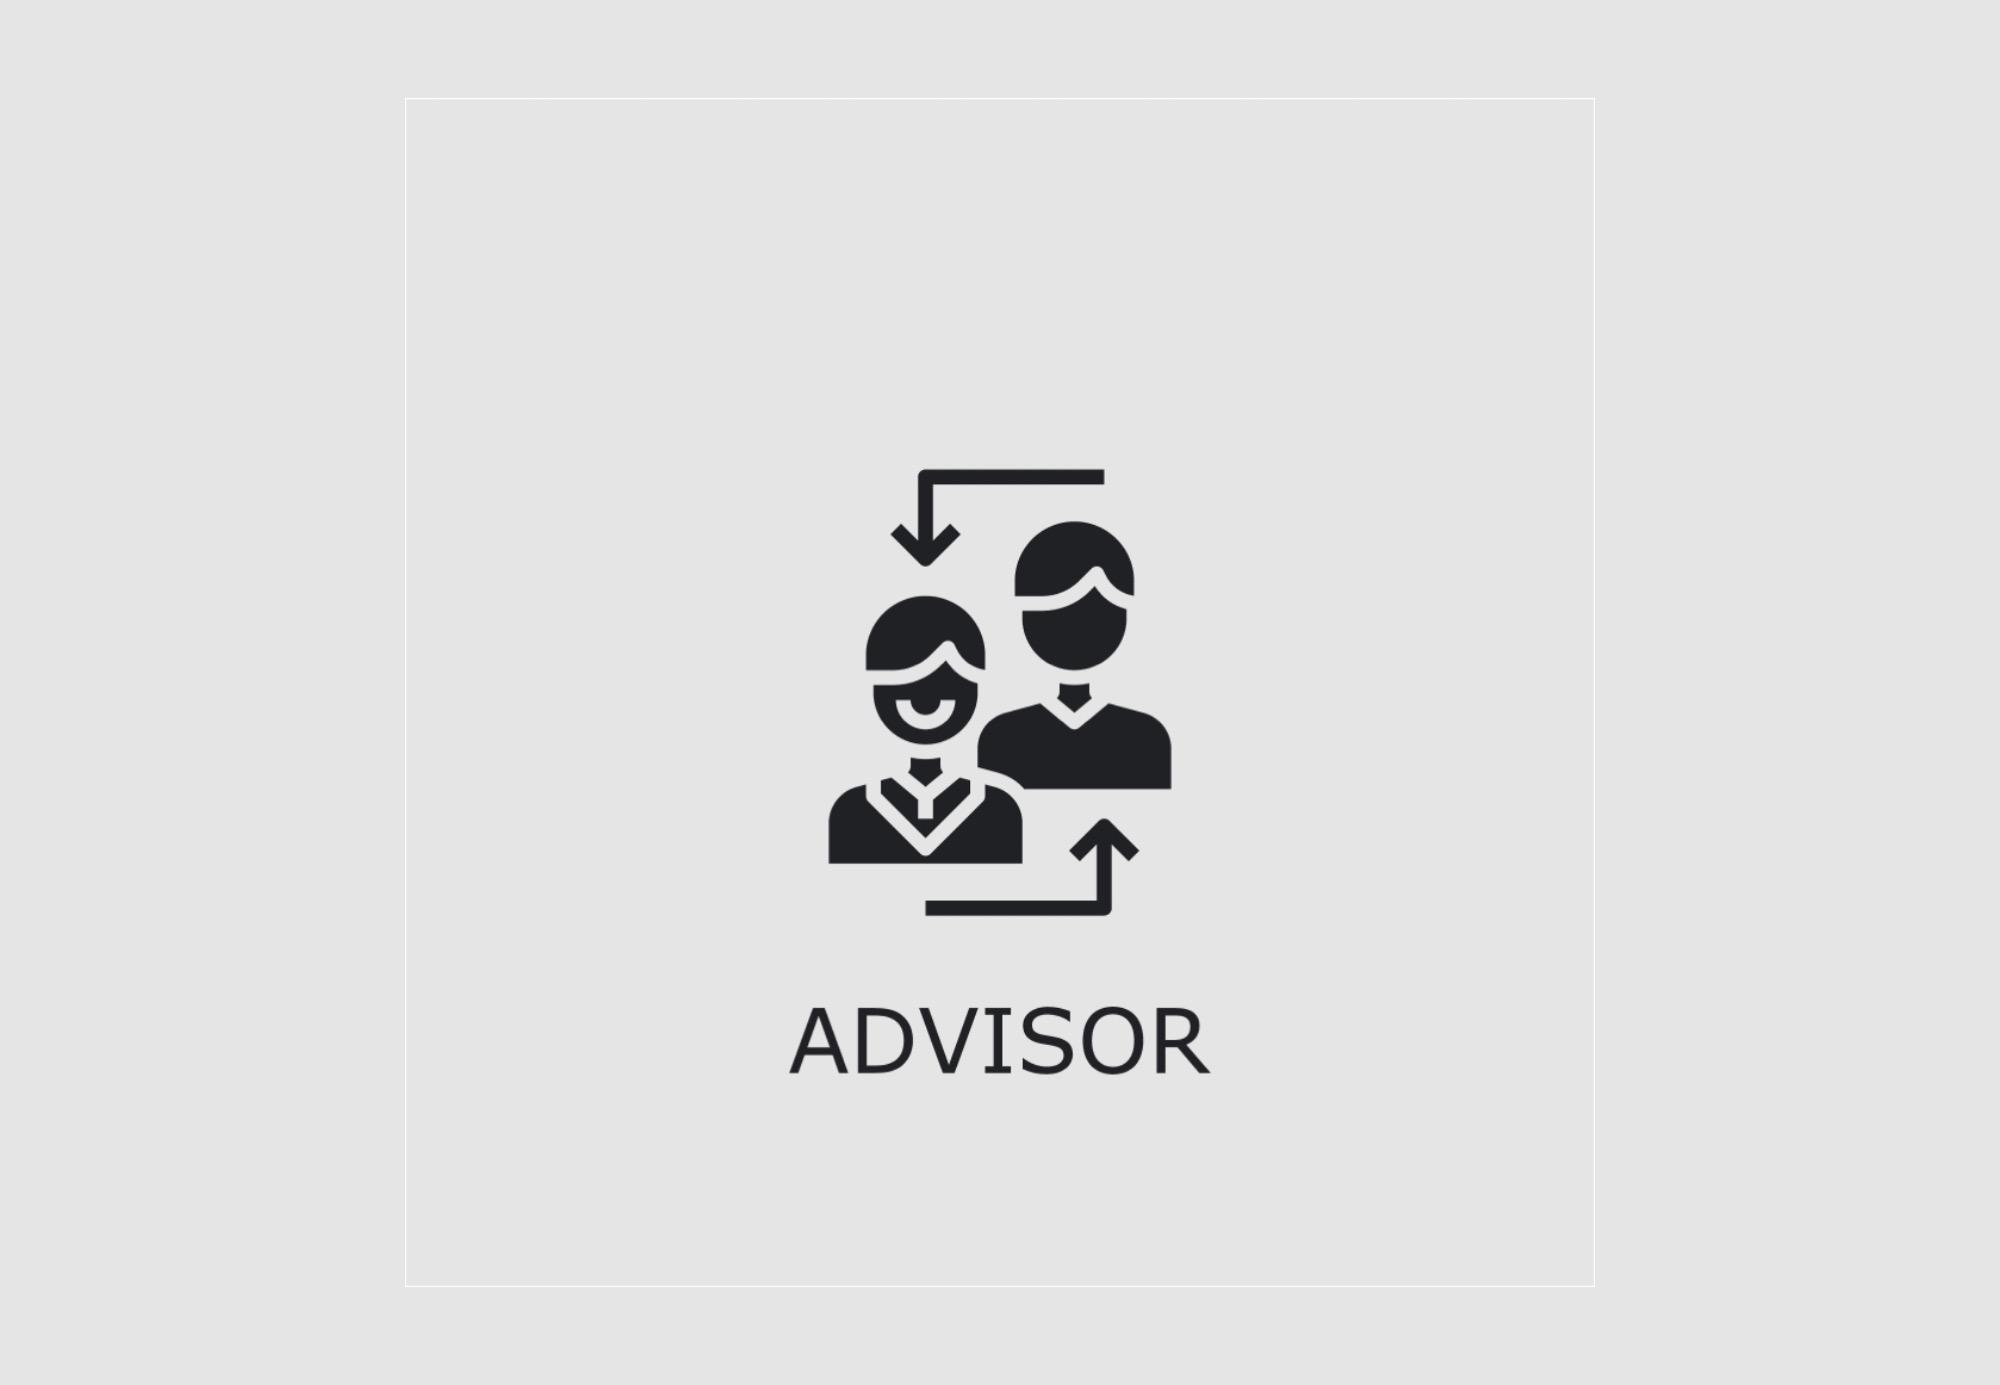 Serviços para Investidores